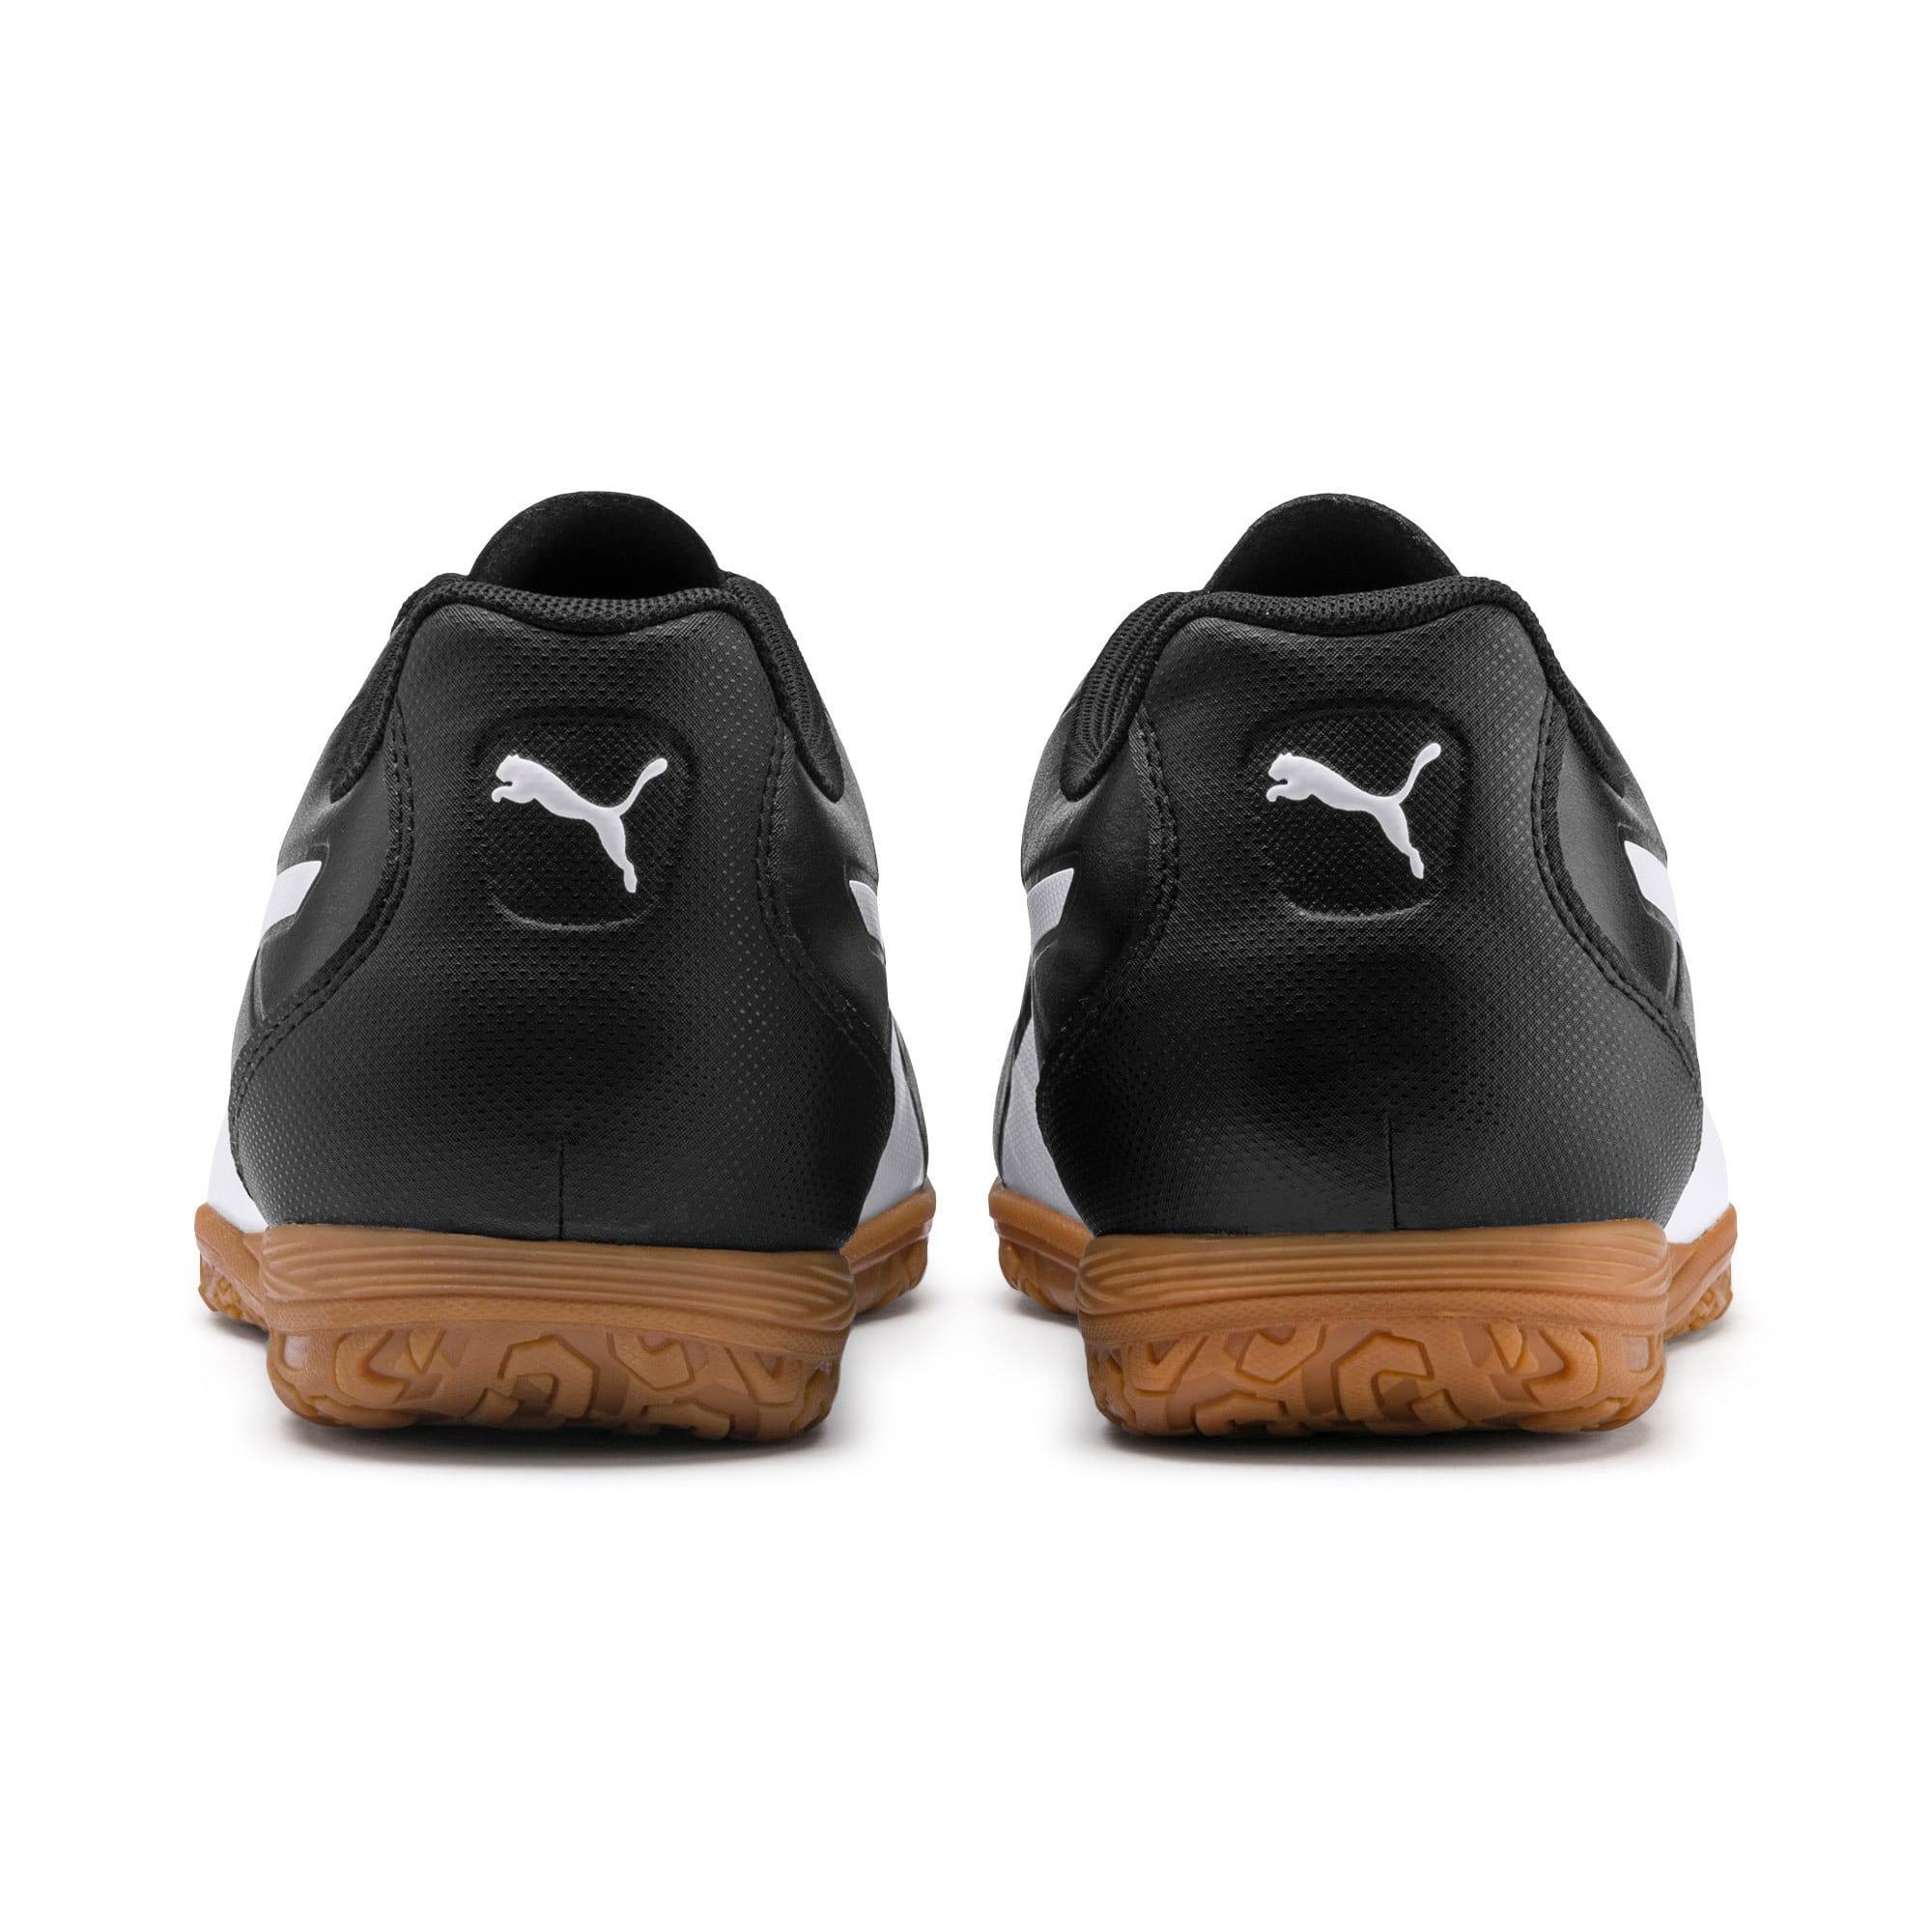 Thumbnail 5 of Monarch IT Men's Football Boots, Puma Black-Puma White, medium-IND